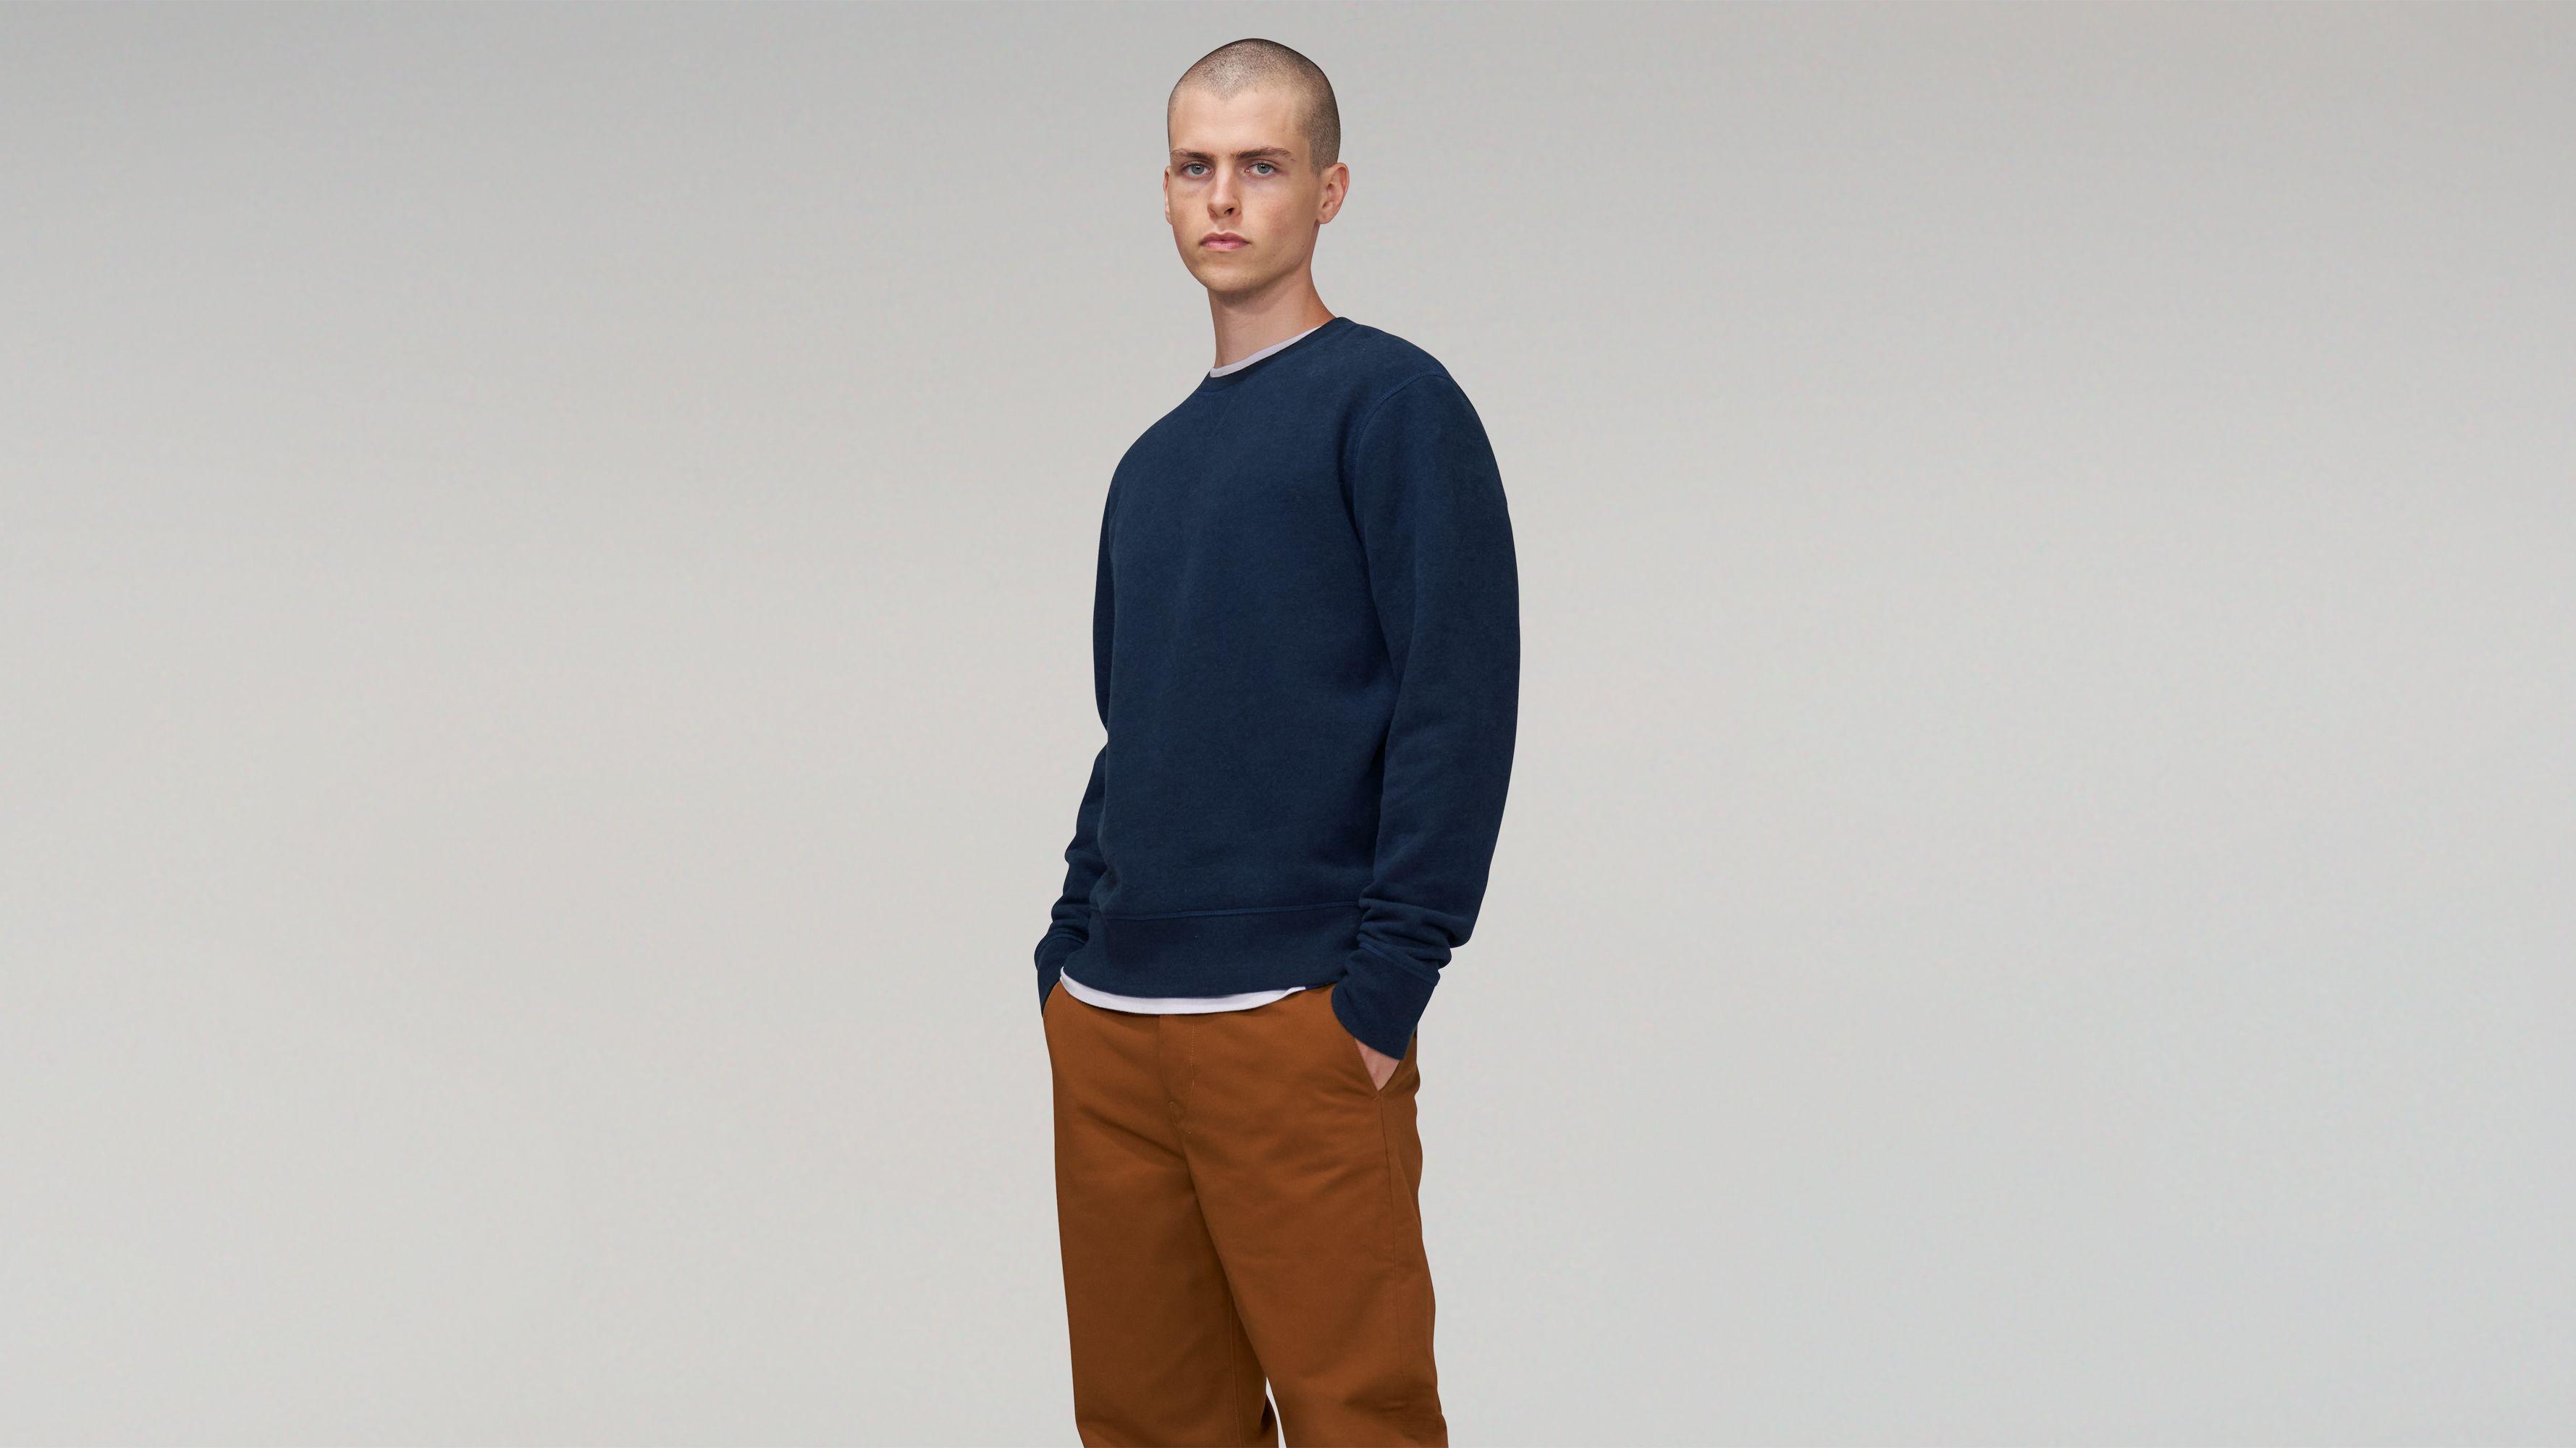 Levis Relaxed Crewneck Sweatshirt